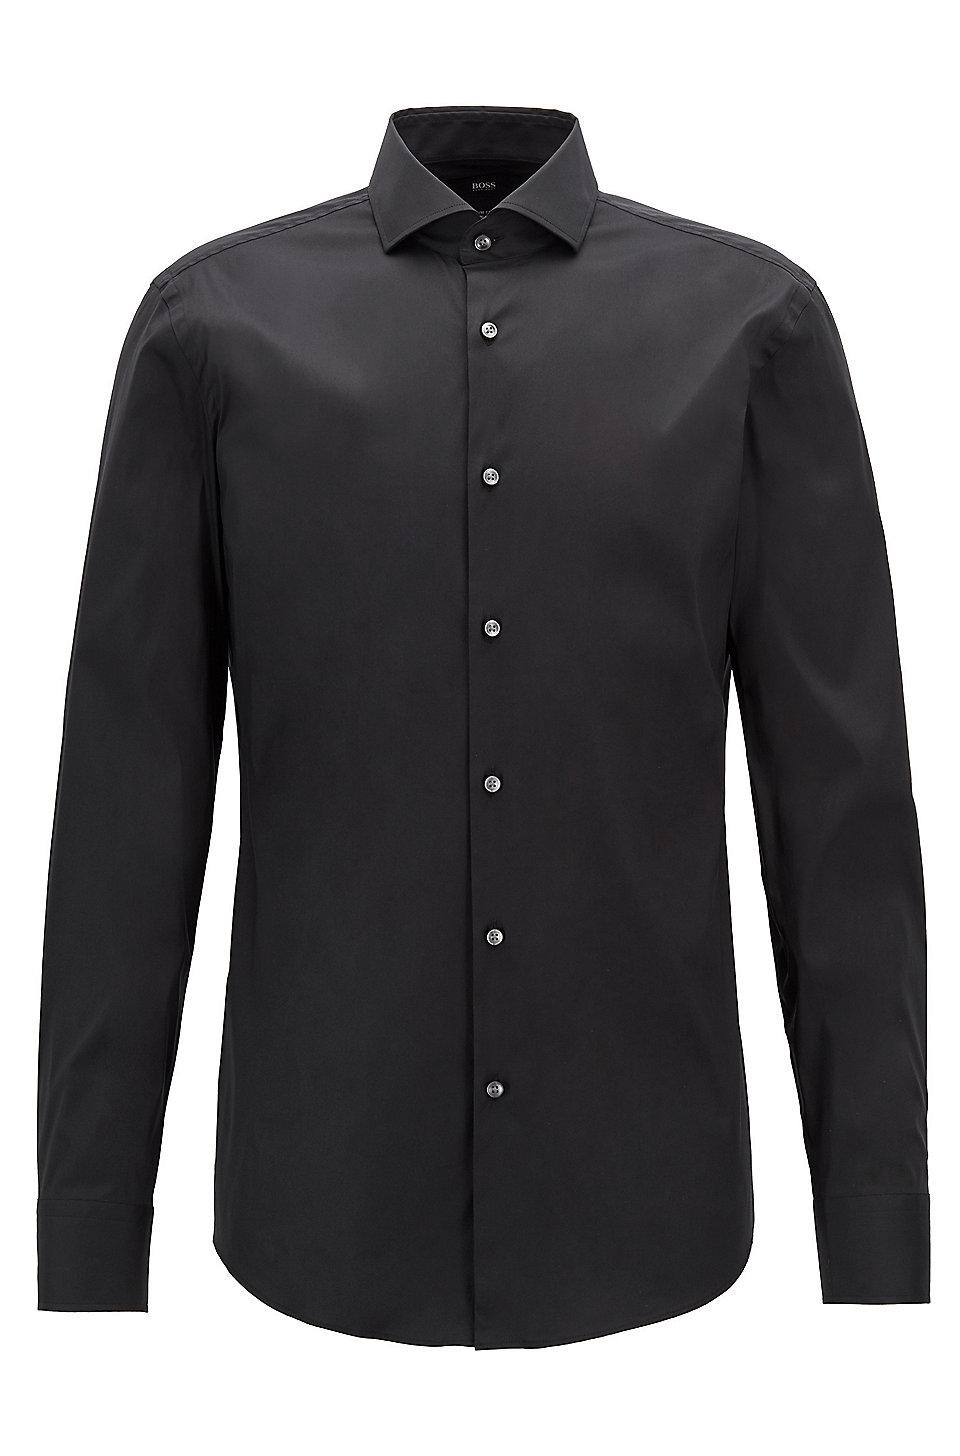 Hugo Boss Empson Extra Slim Fit Burgundy Shirt